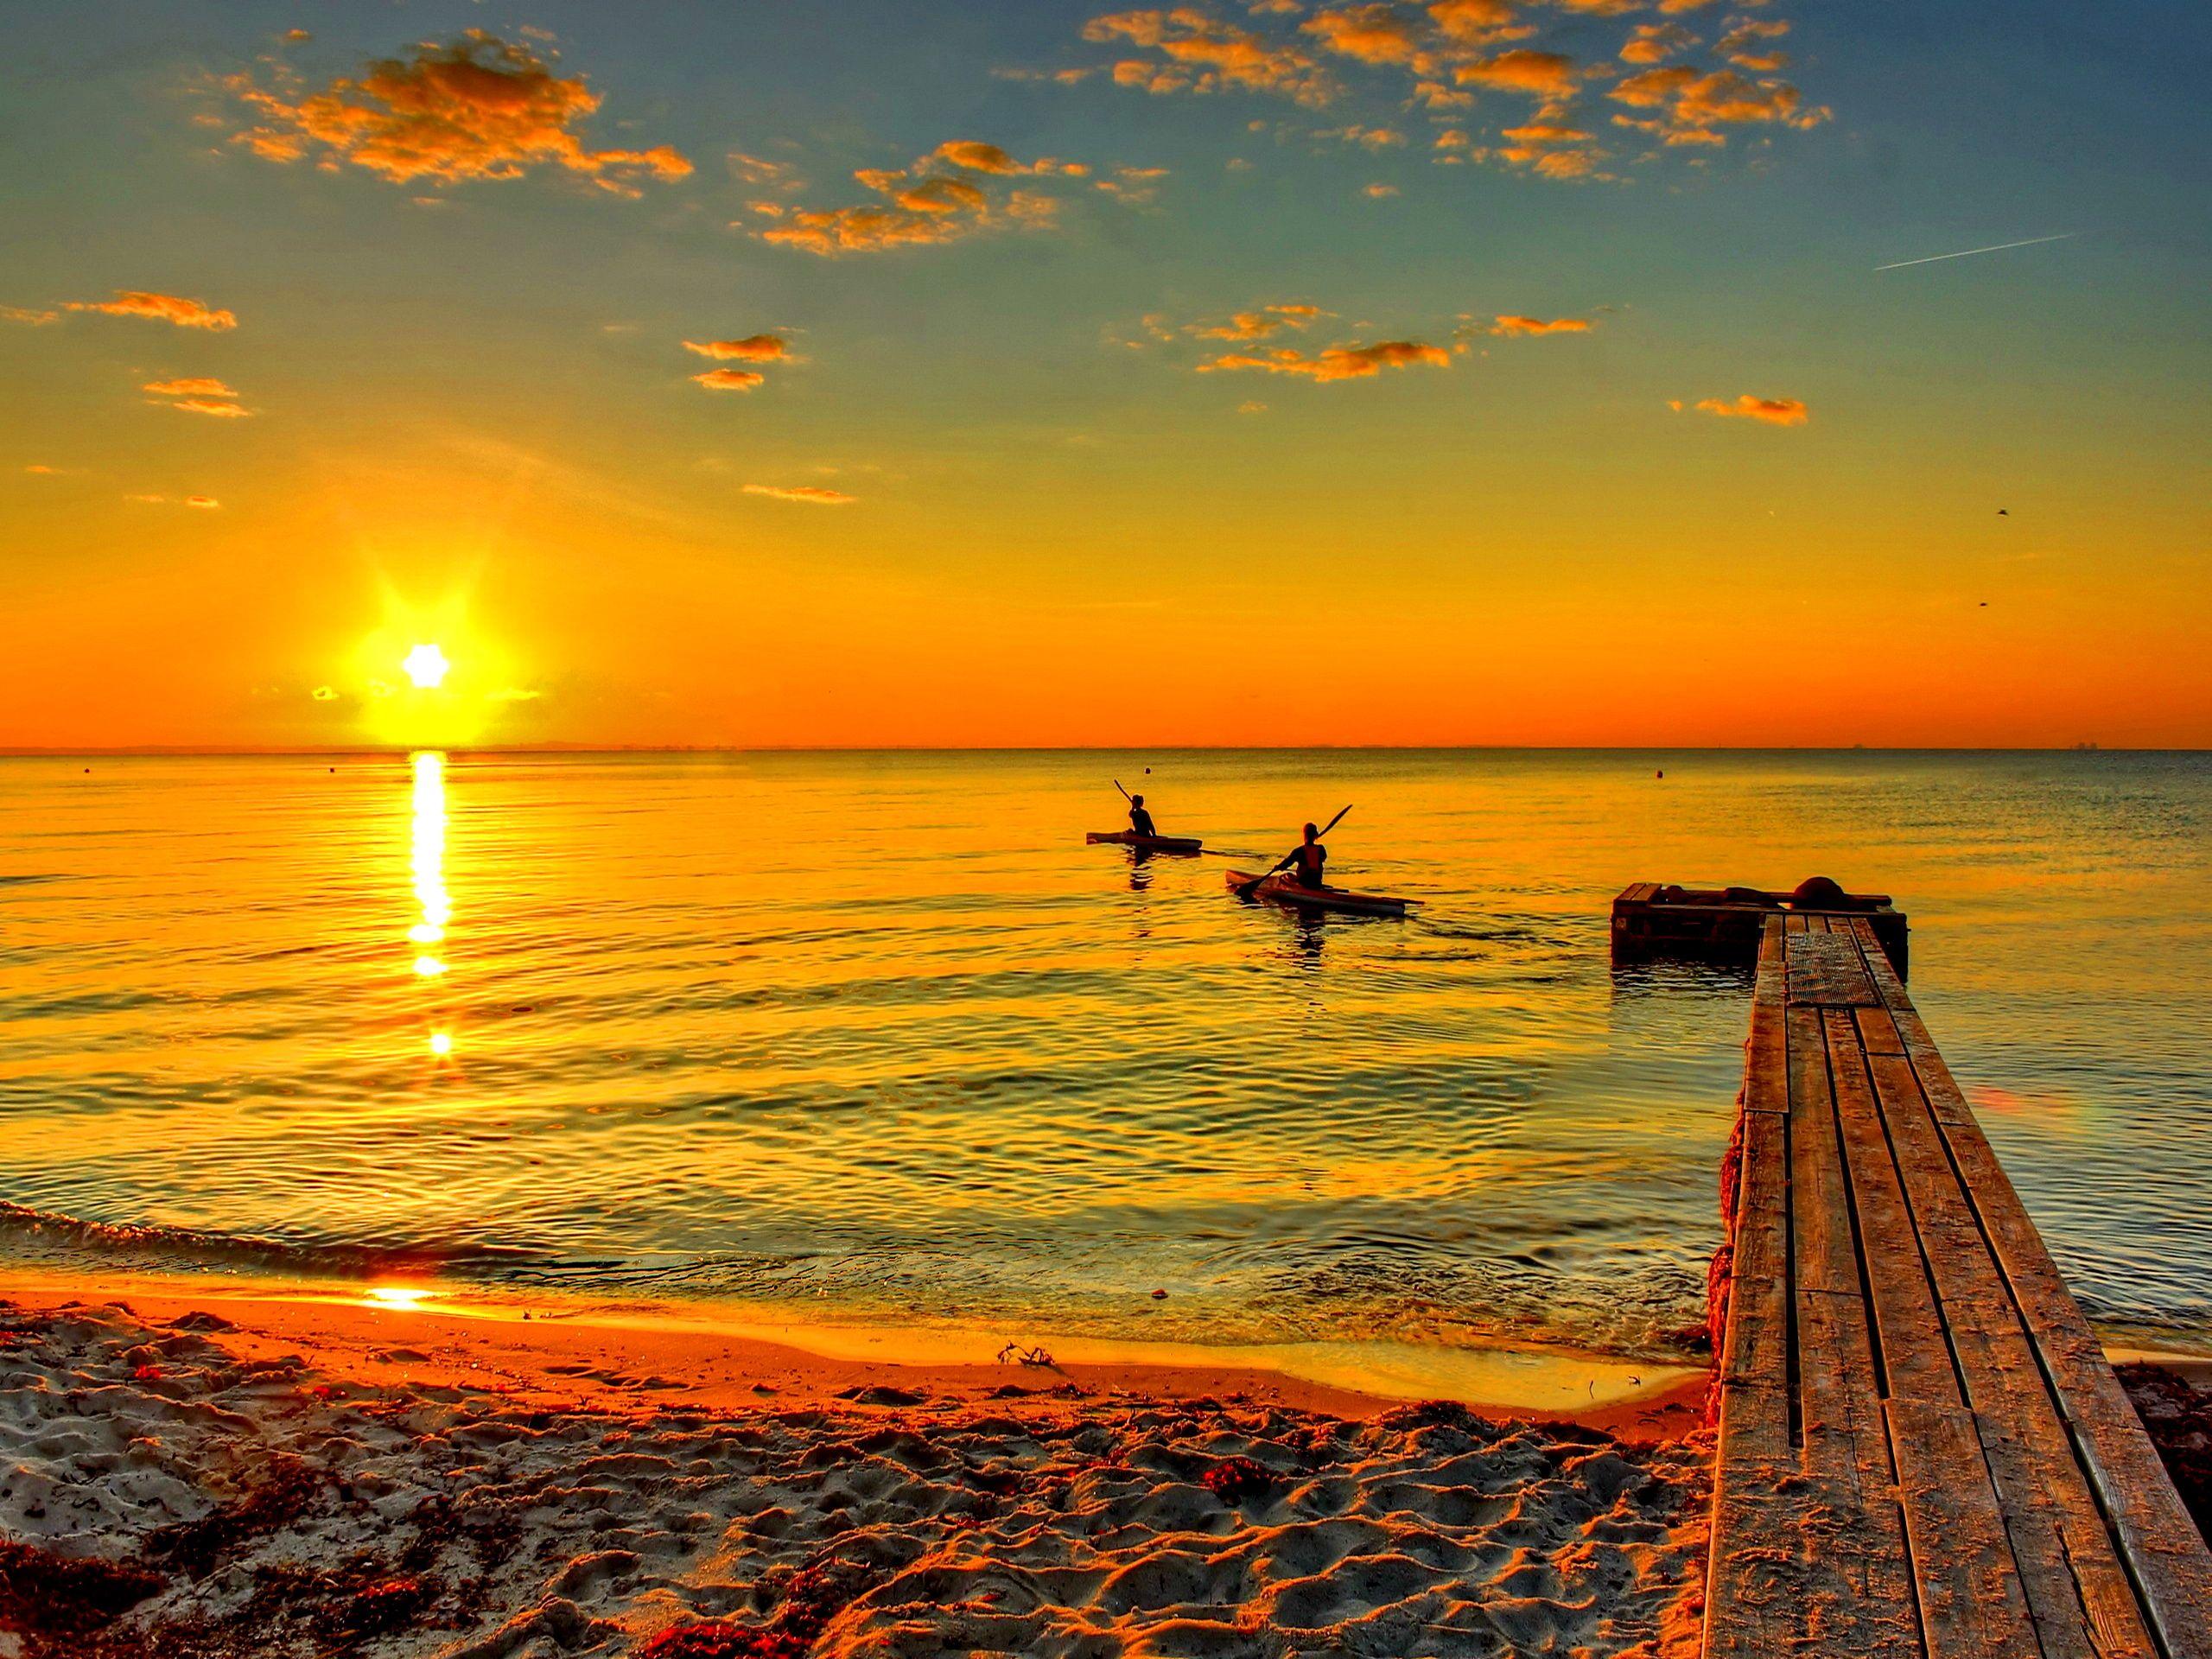 sunrise landscape wallpaper hd